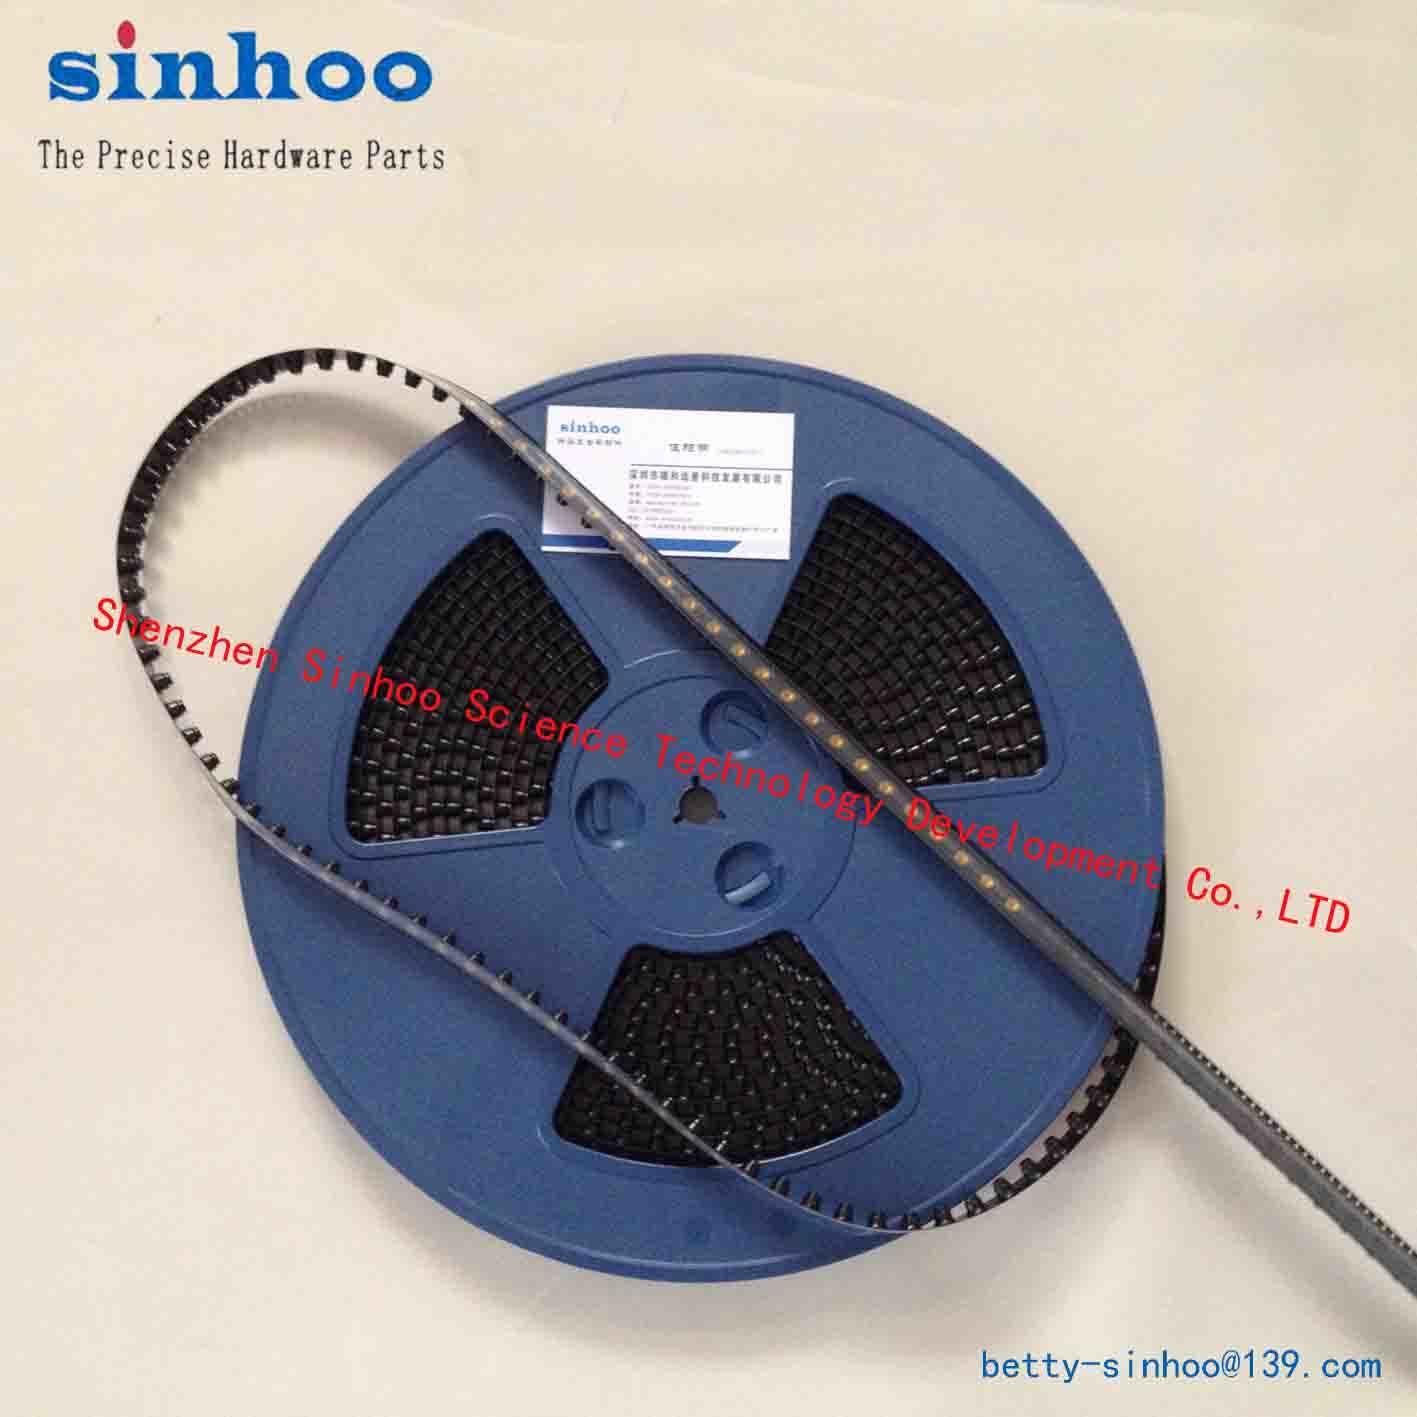 Smtso-M2-6.6et, SMD Nut, Weld Nut, Reelfast/Surface Mount Fasteners/SMT Standoff/SMT Nut, Steel Reel